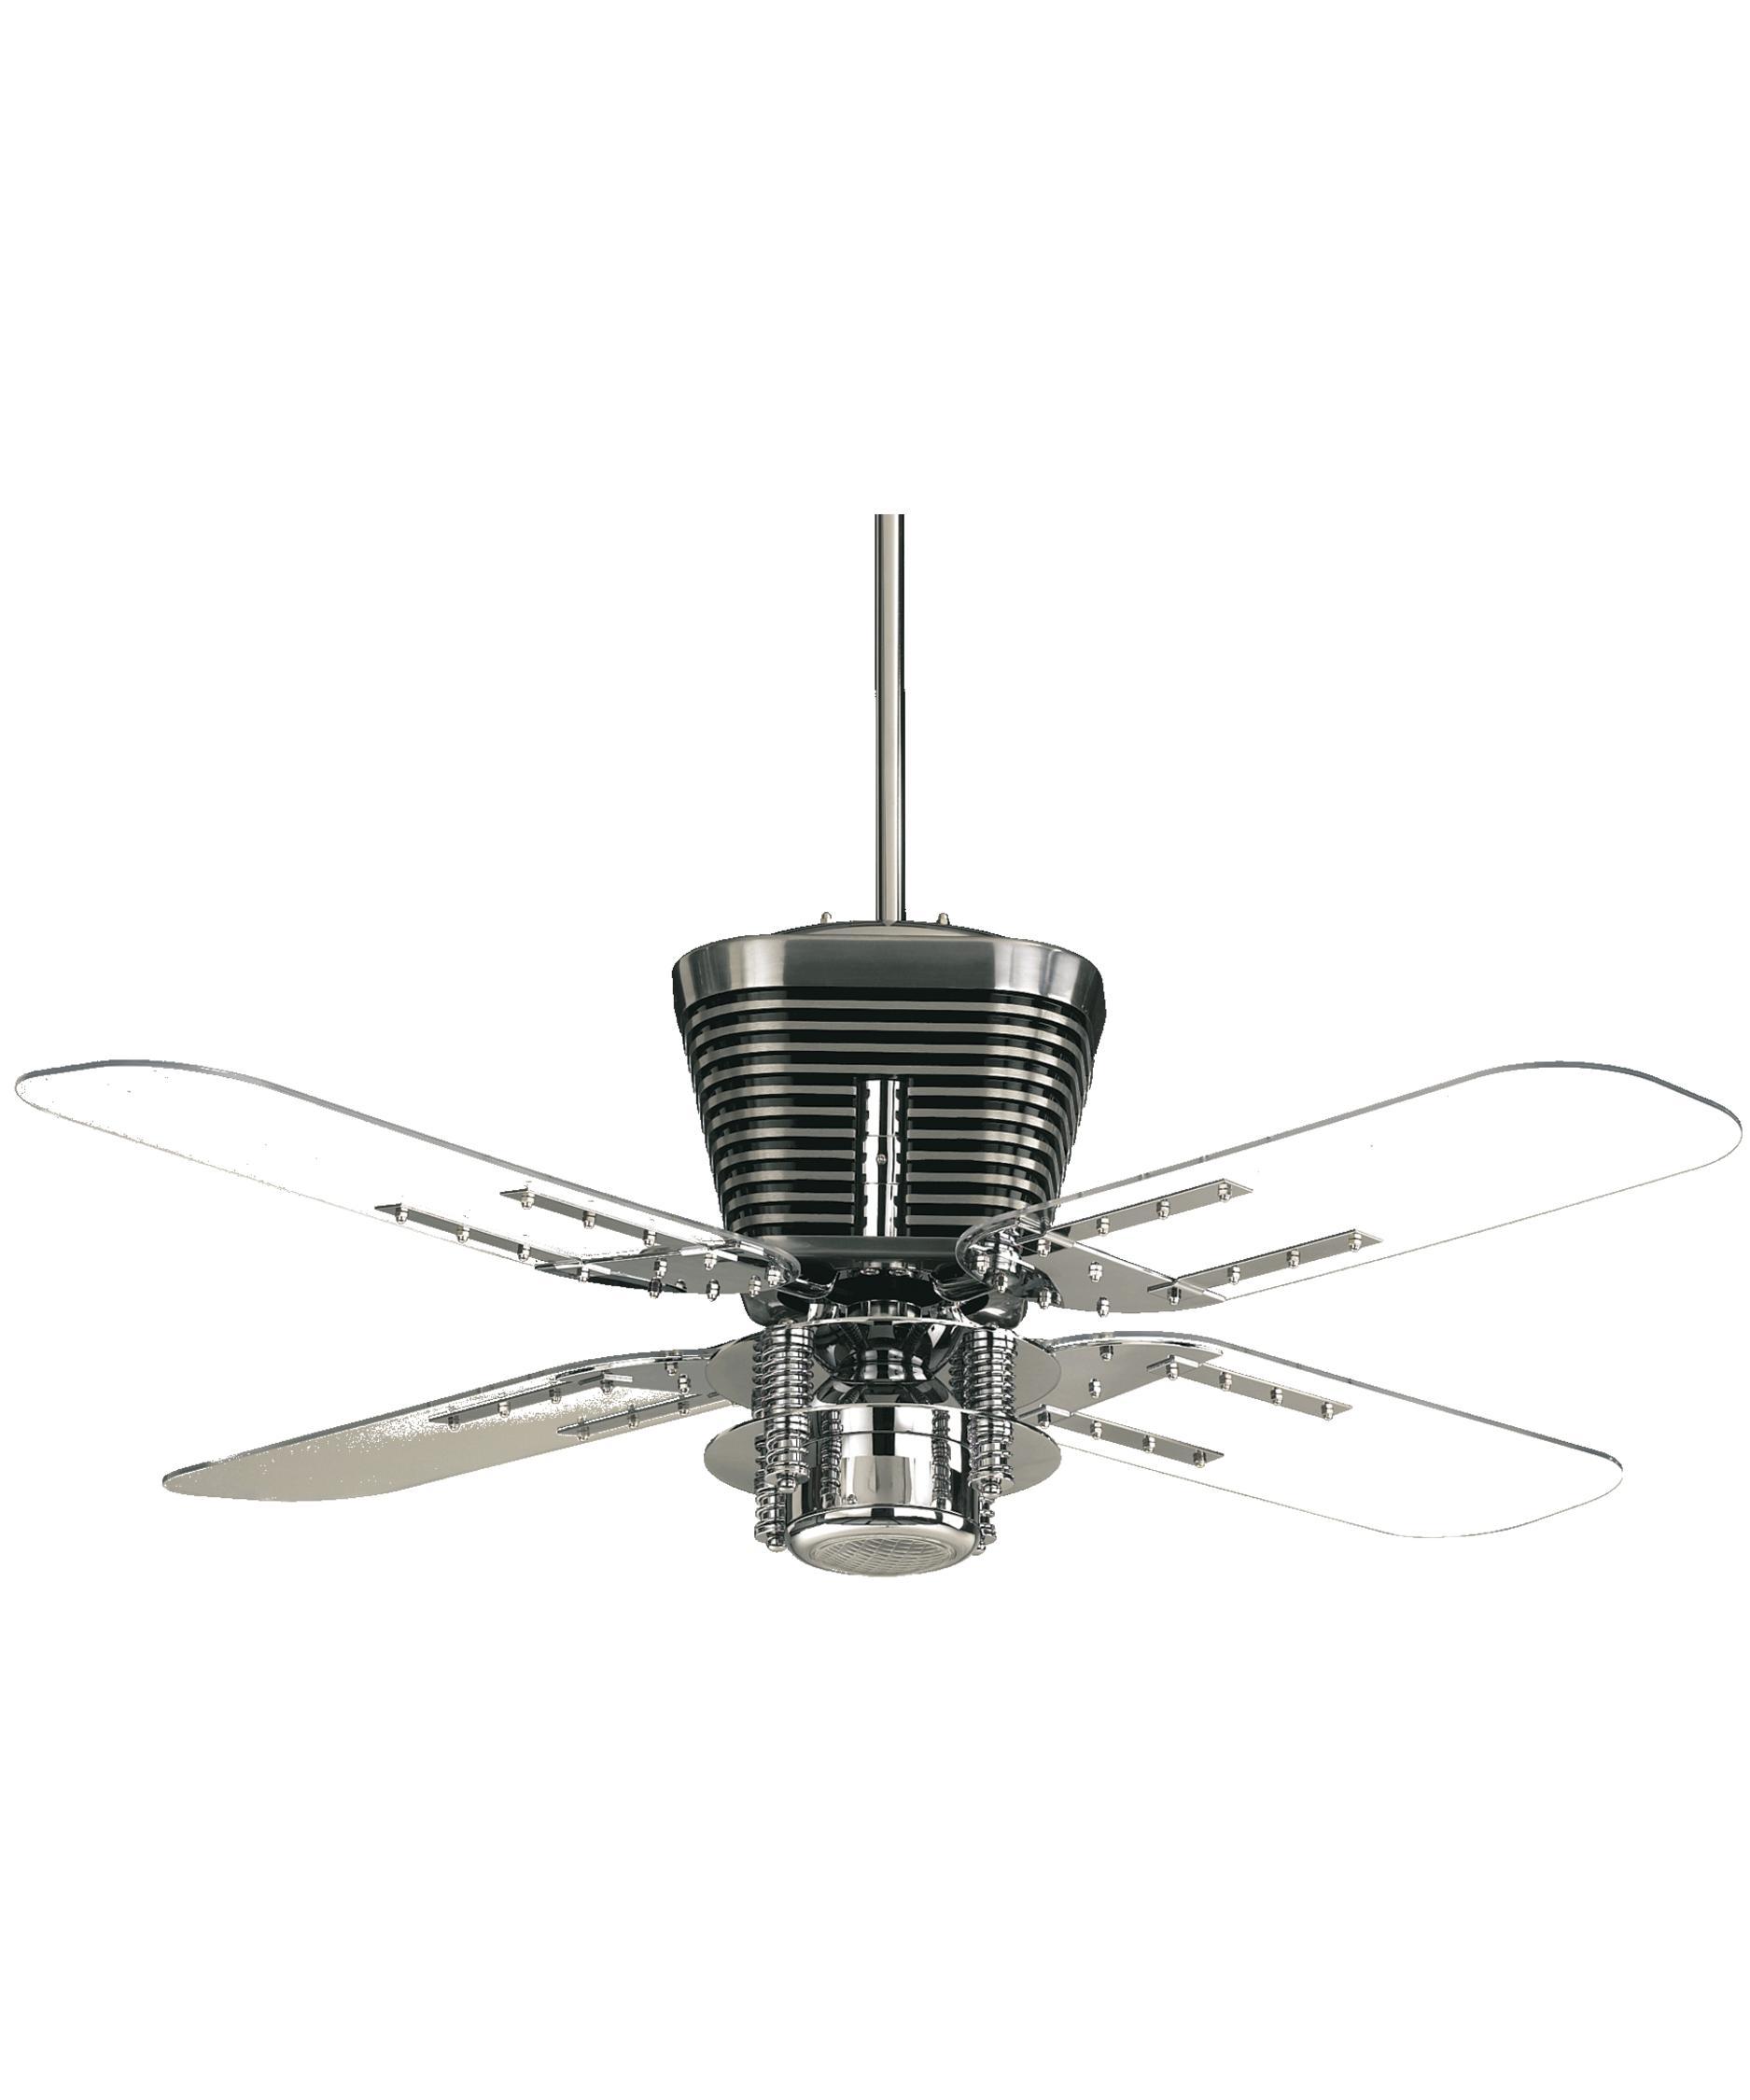 quorum international 93524 retro 52 inch 4 blade ceiling fan